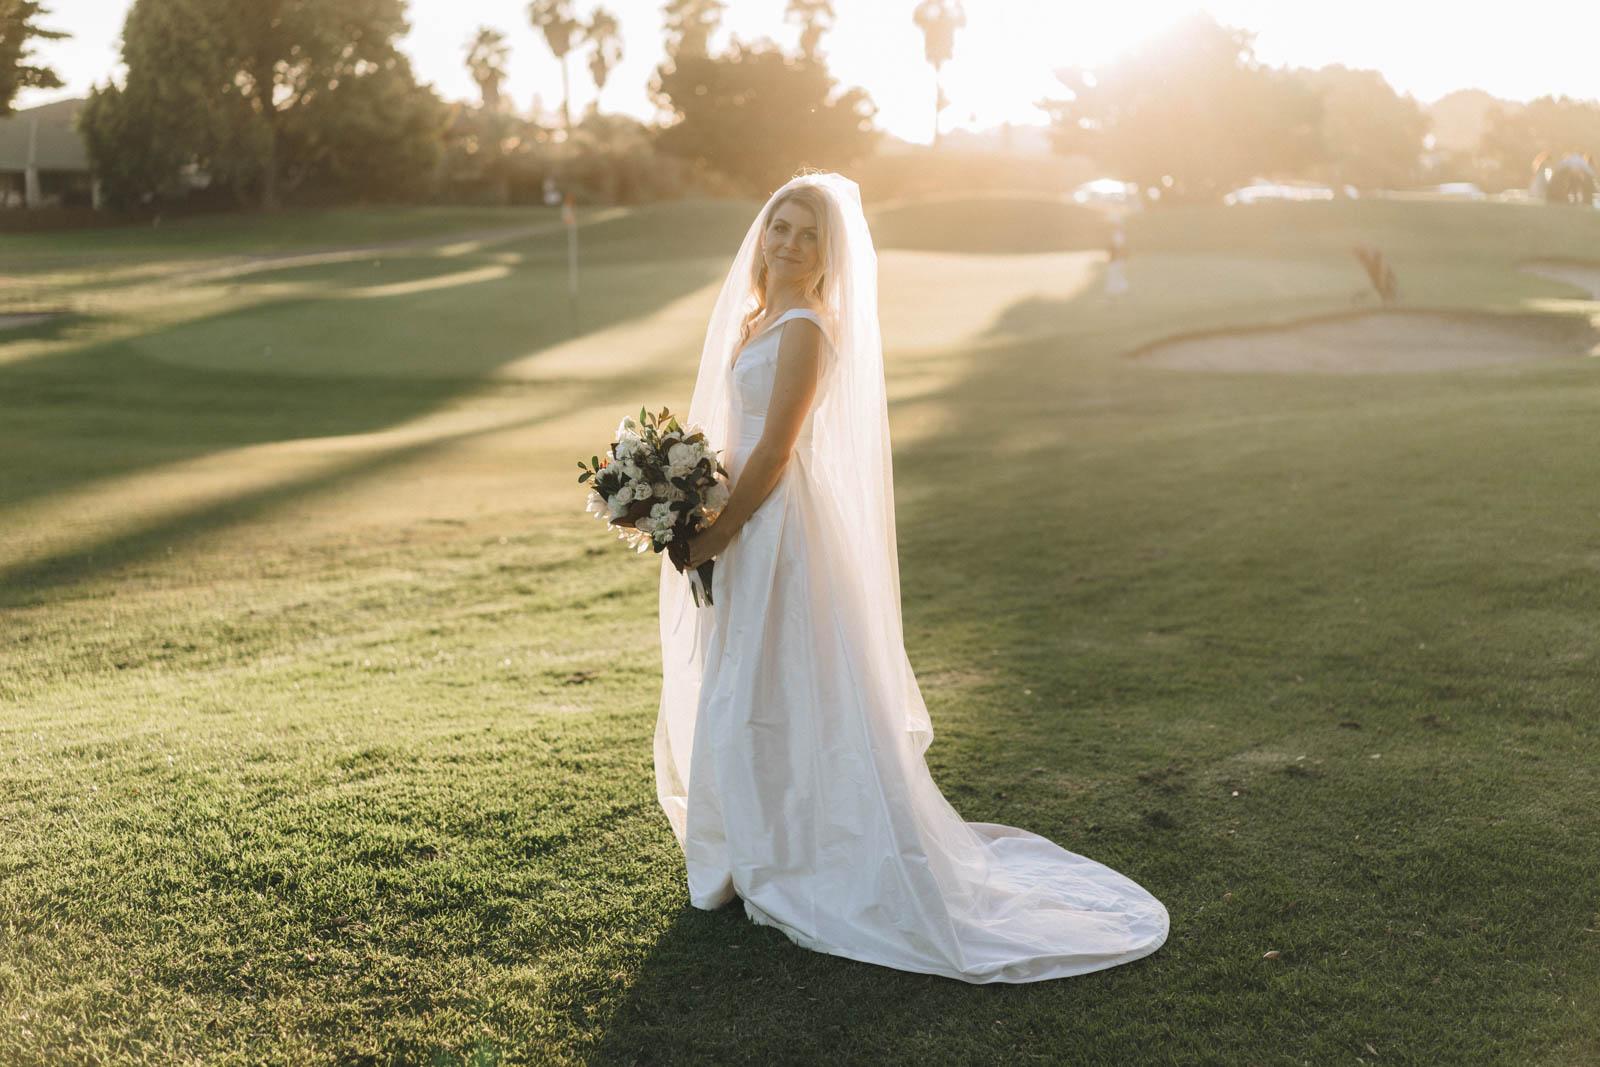 newfound-s-p-mt-maunganui-tauranga-wedding-photographer-1754-A9_07213